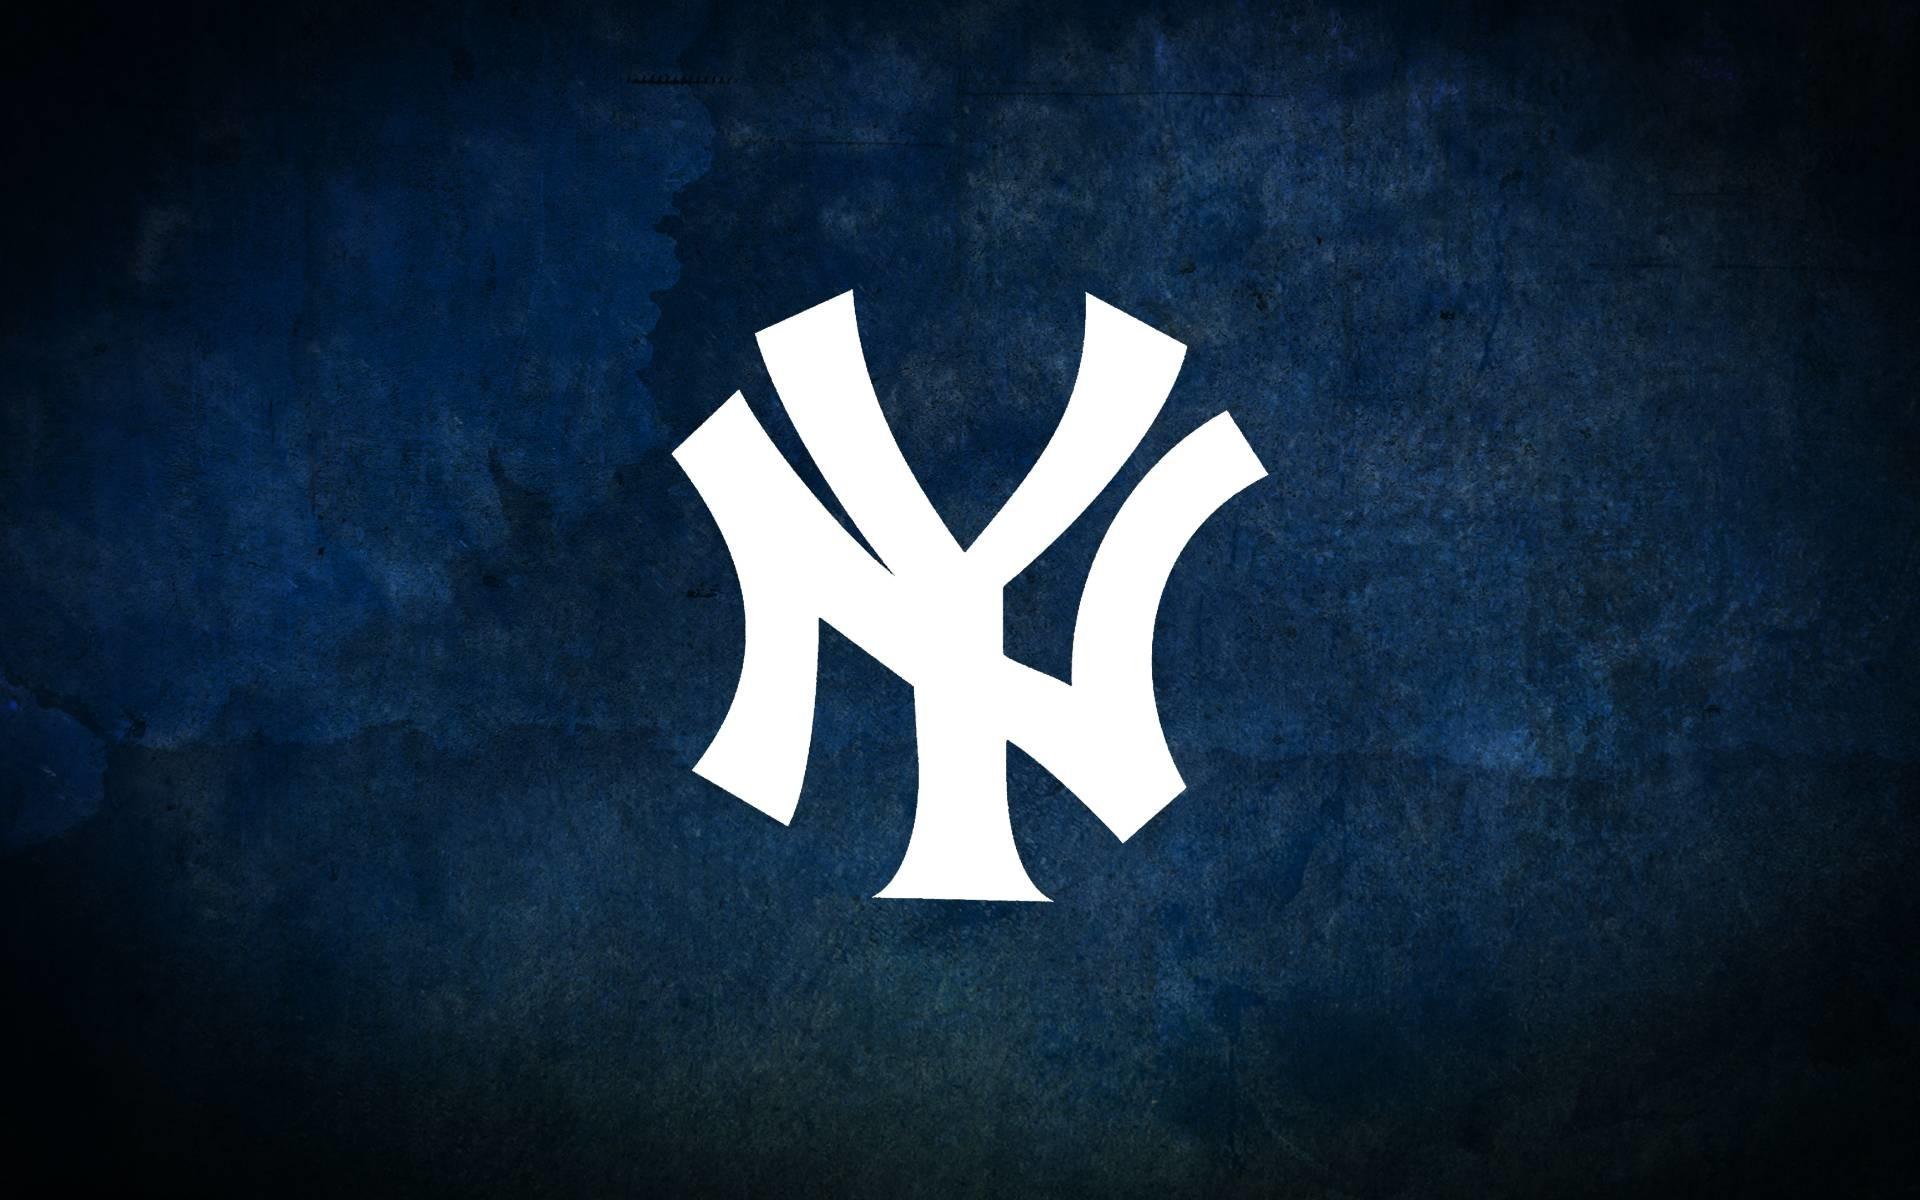 Download Basketball Team Yankees Logo Wallpaper | Download HD .